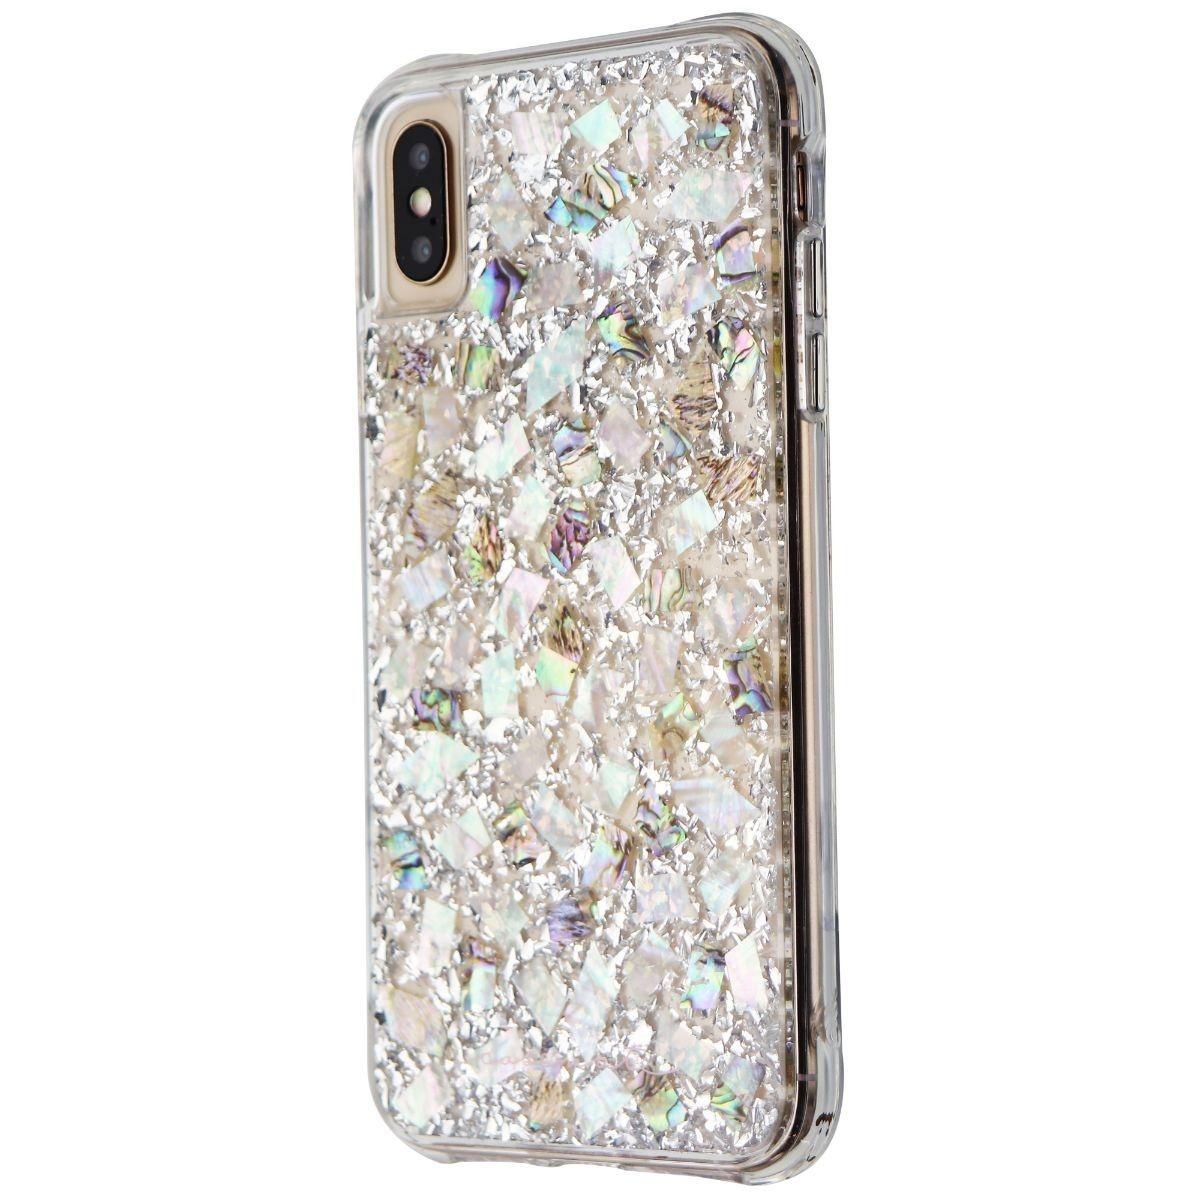 Case-Mate CM037844 Karat Case for Apple iPhone XS Max - Pearl